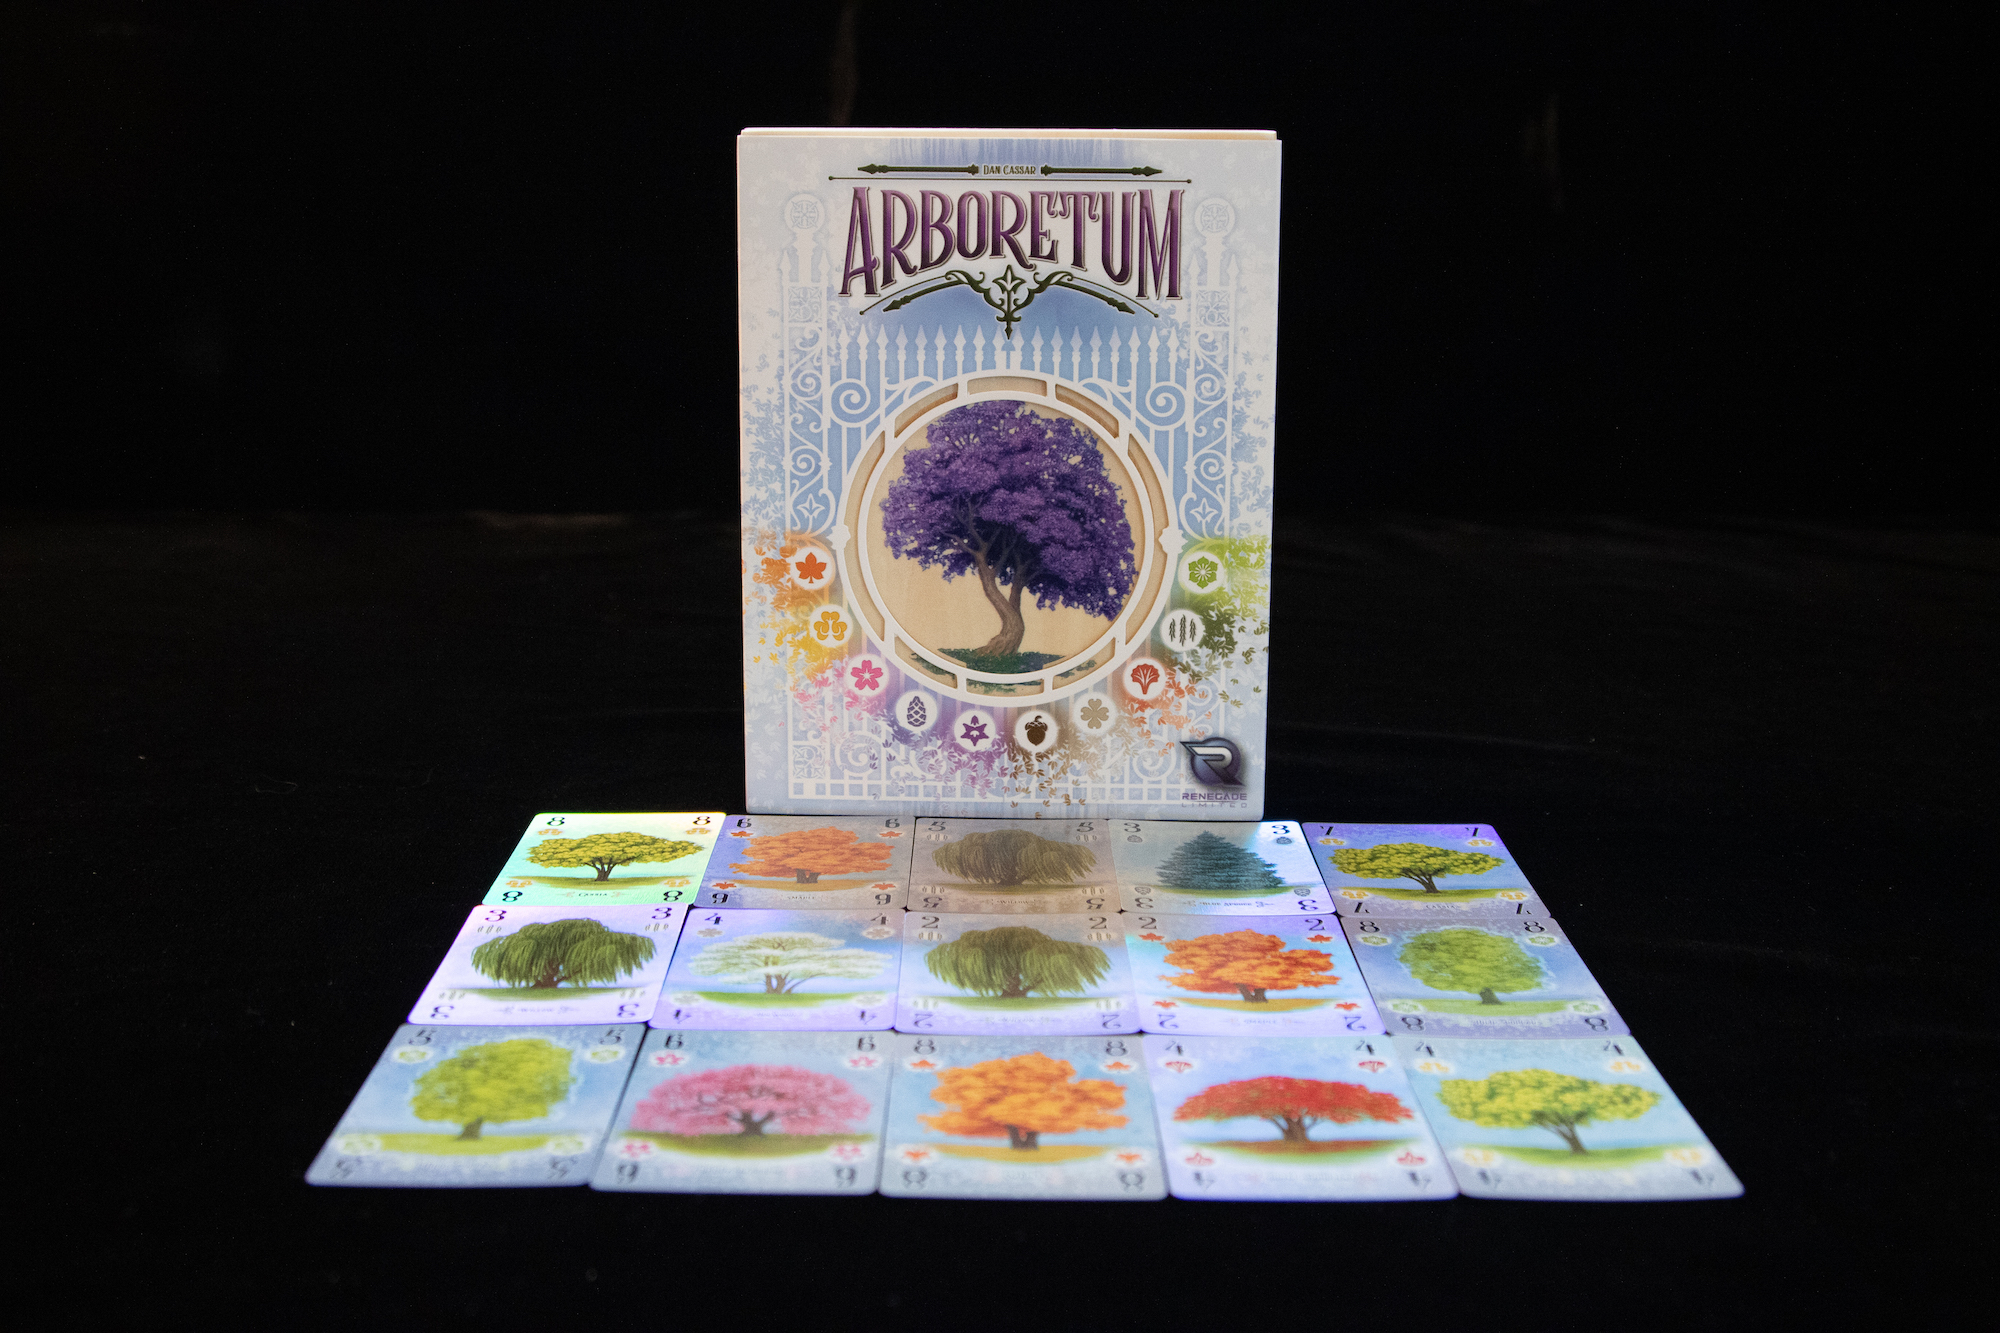 Arboretum_Deluxe (6 of 6).jpg